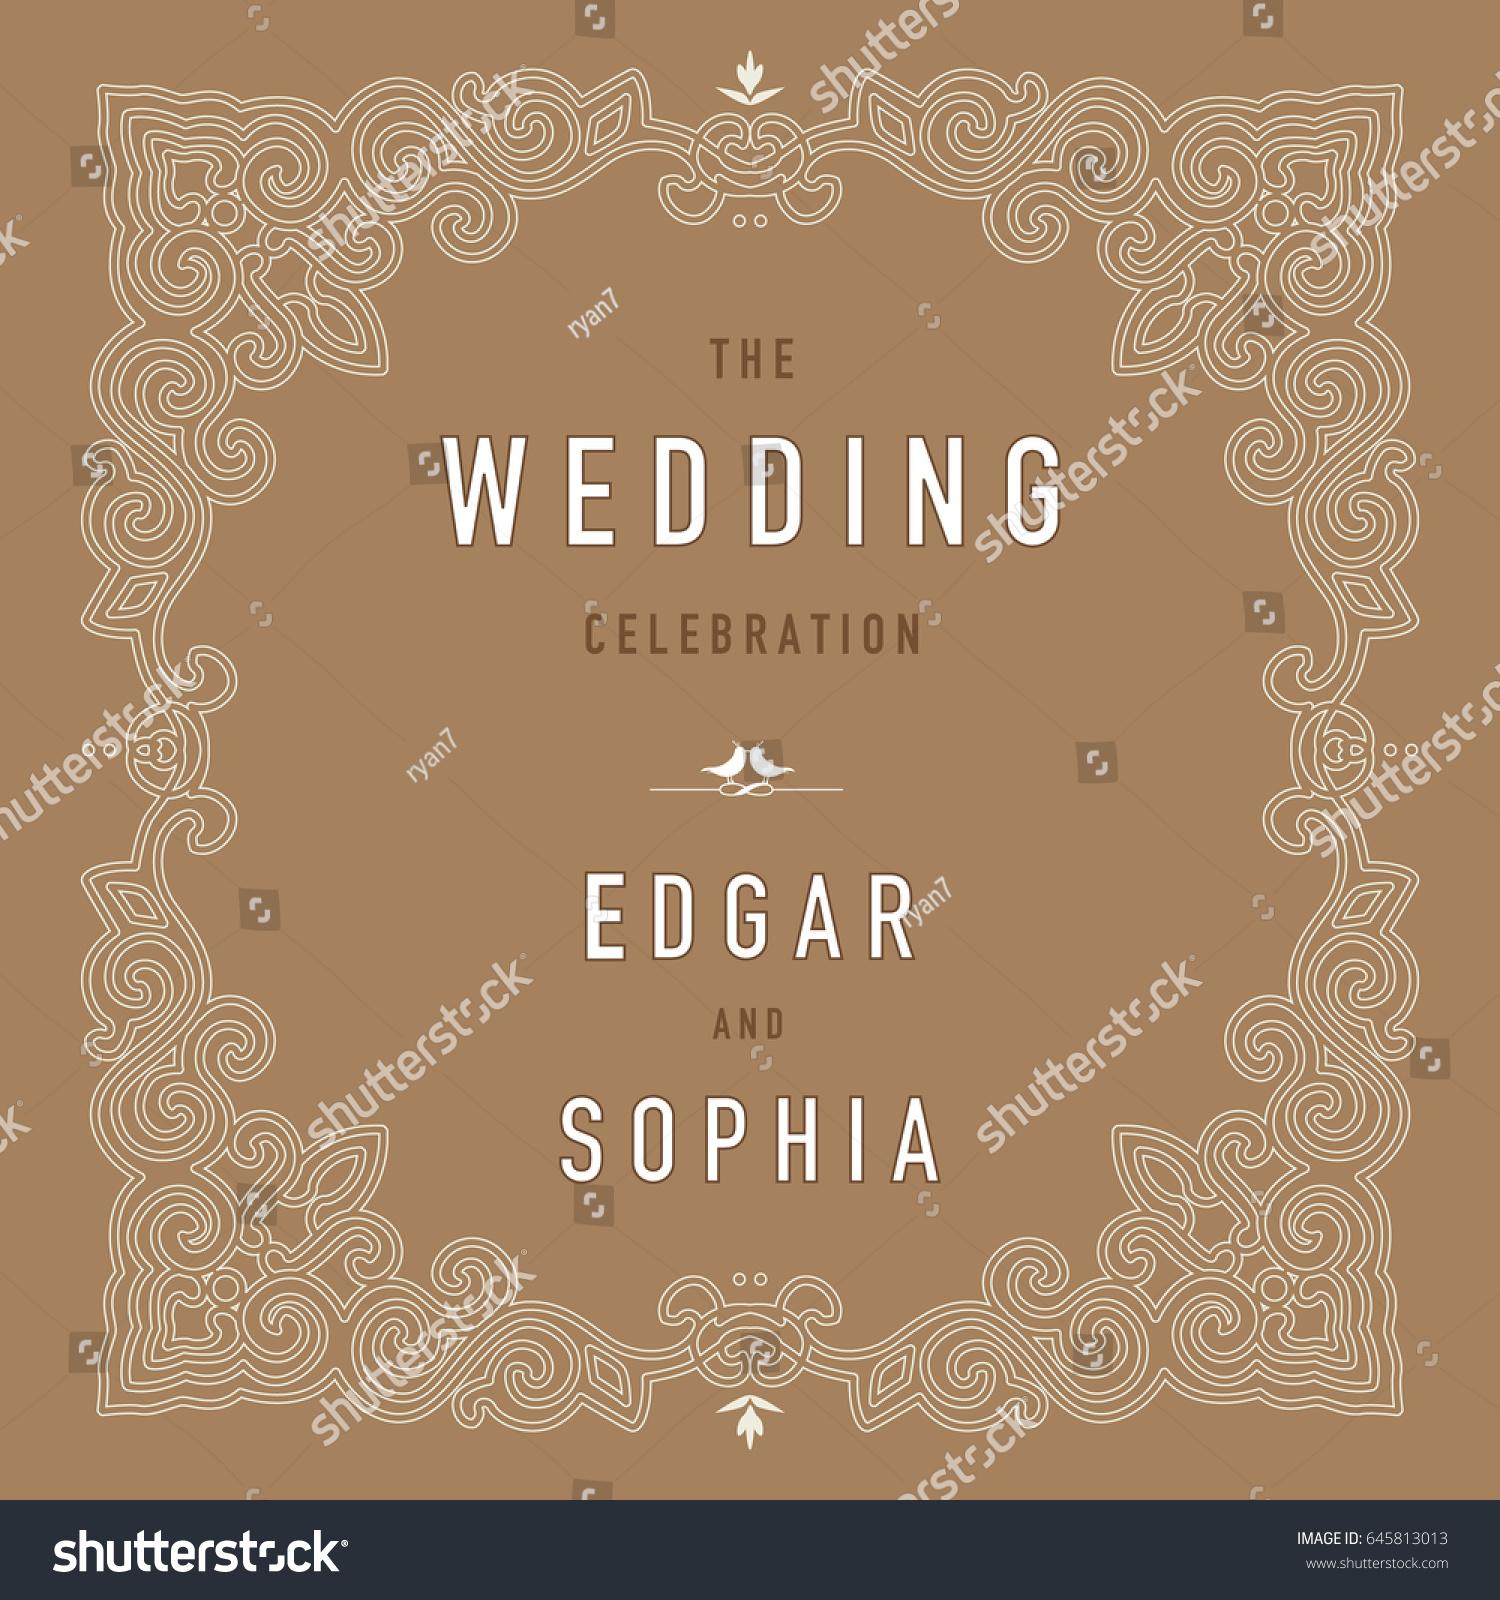 Wedding invitation design layout stock vector 645813013 shutterstock stopboris Image collections